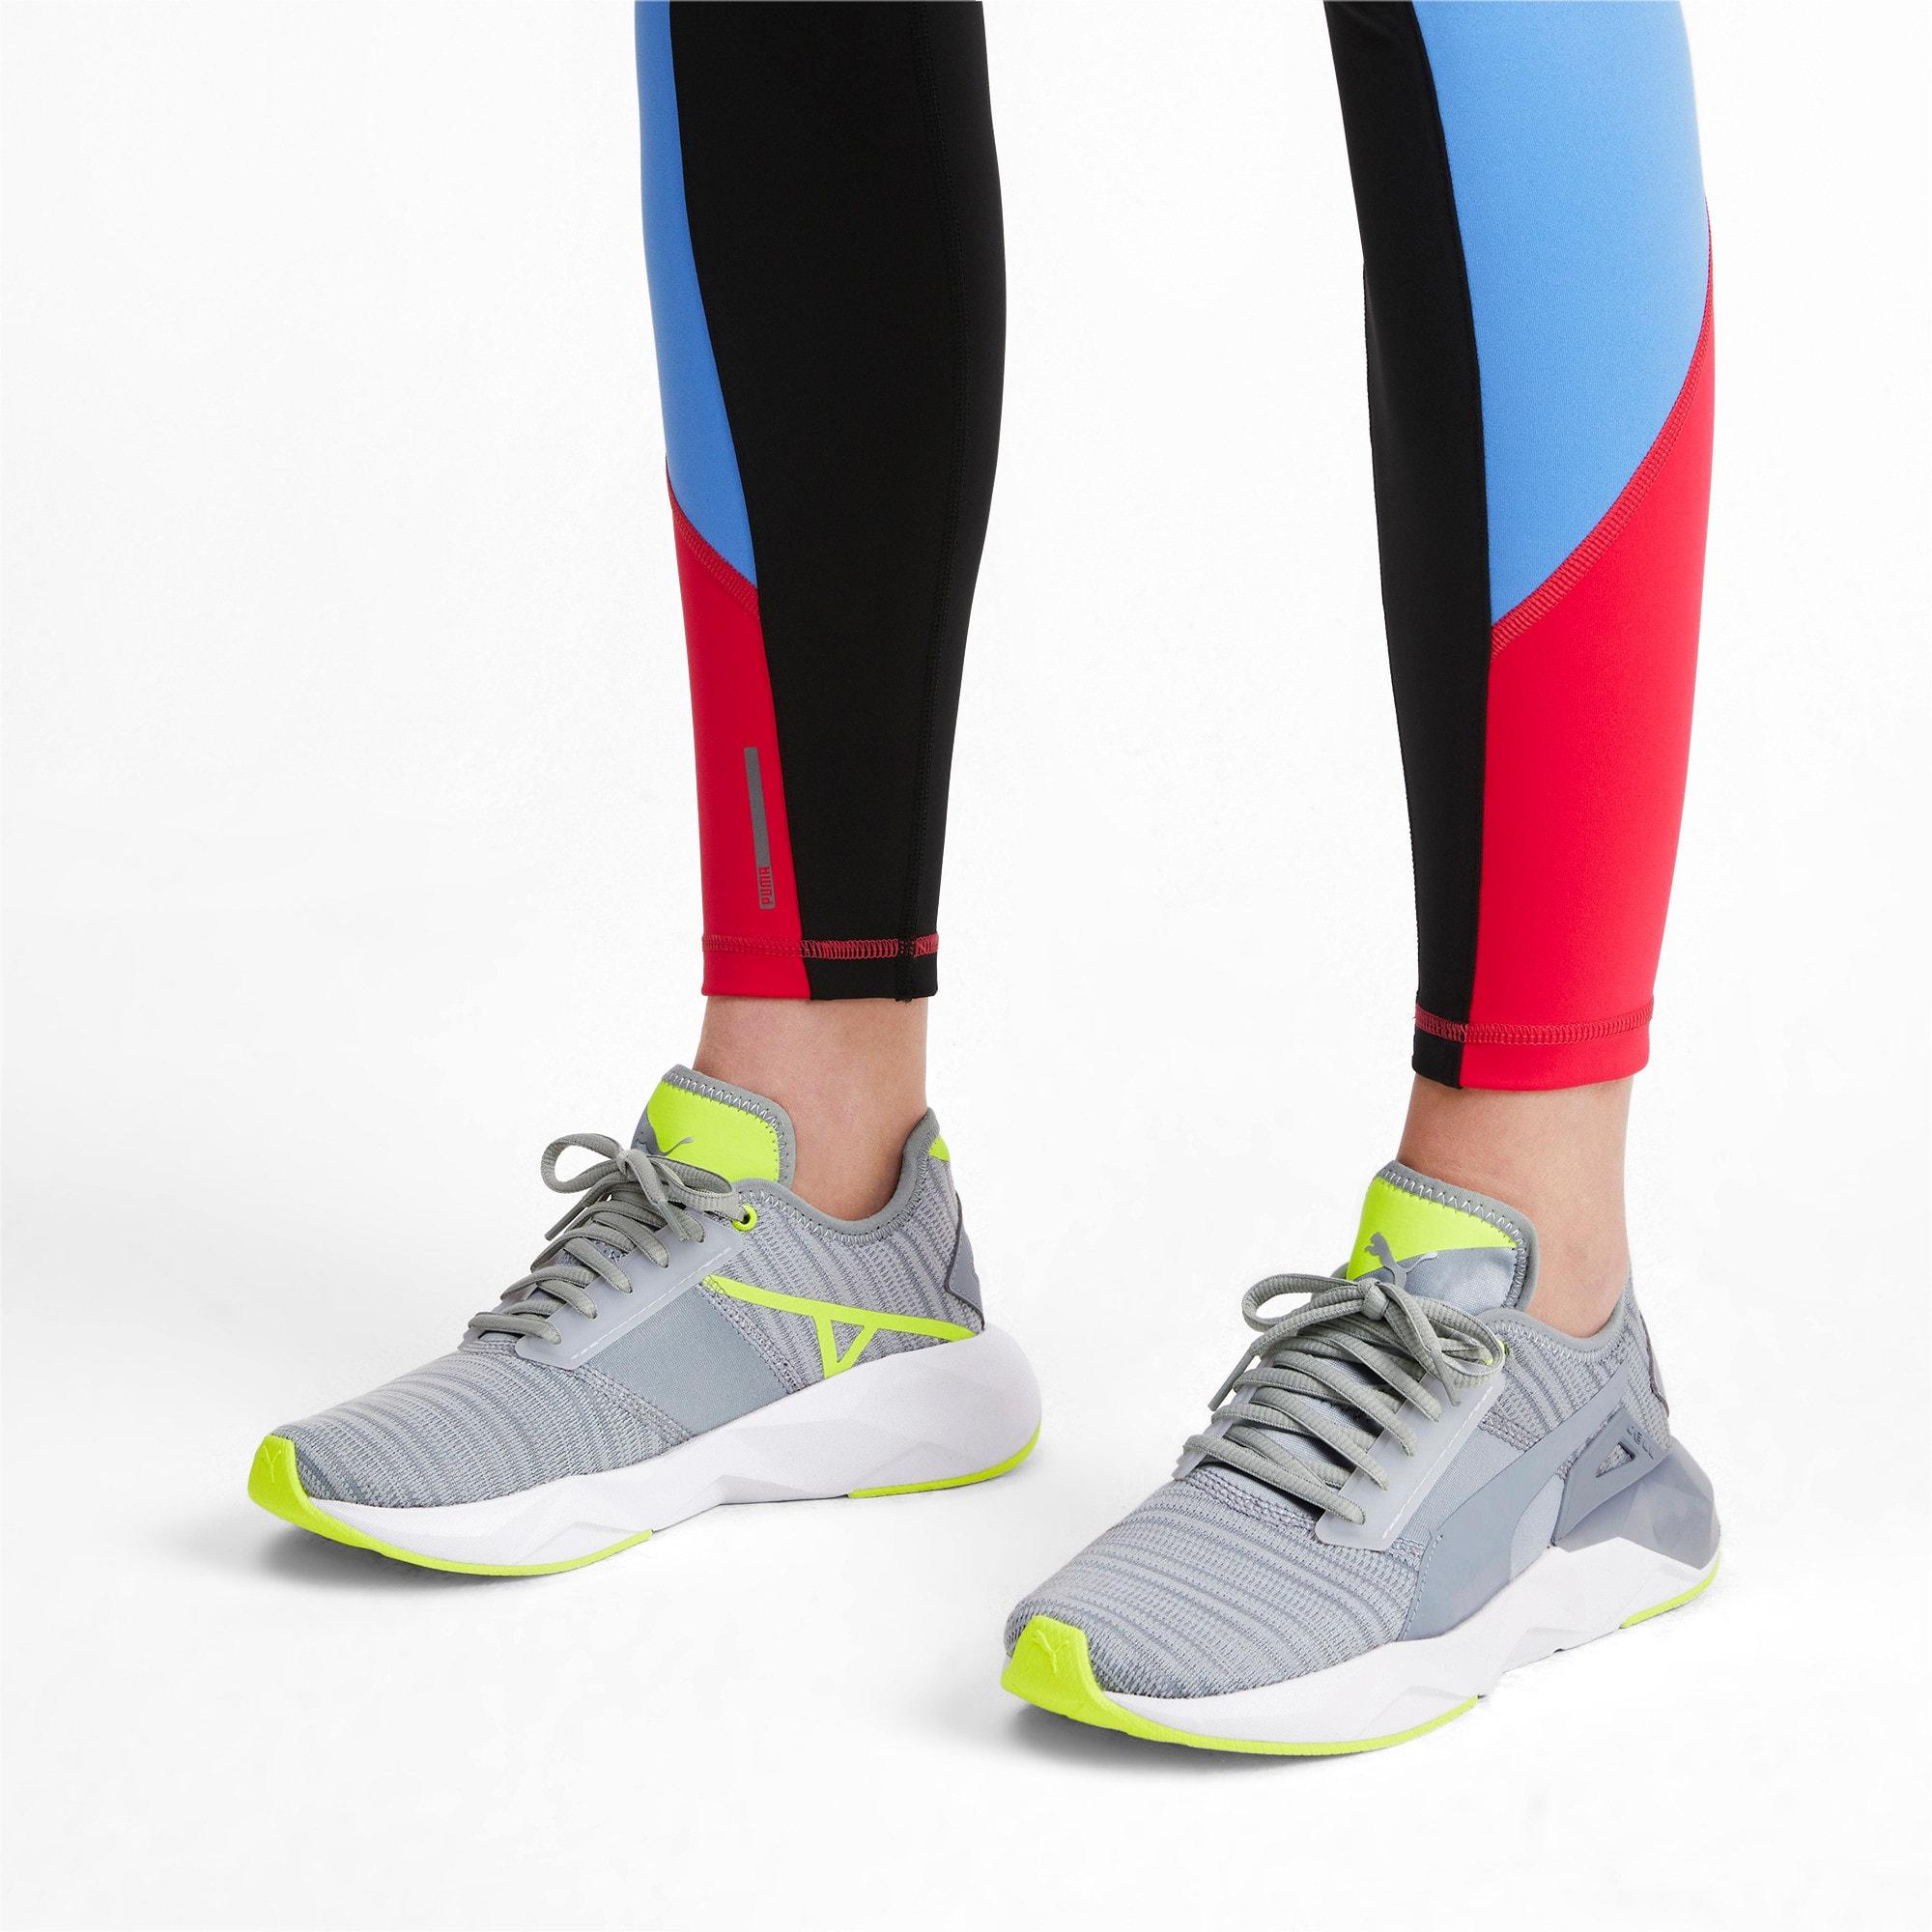 Thumbnail 2 of CELL Plasmic Damen Sneaker, Quarry-Puma White, medium